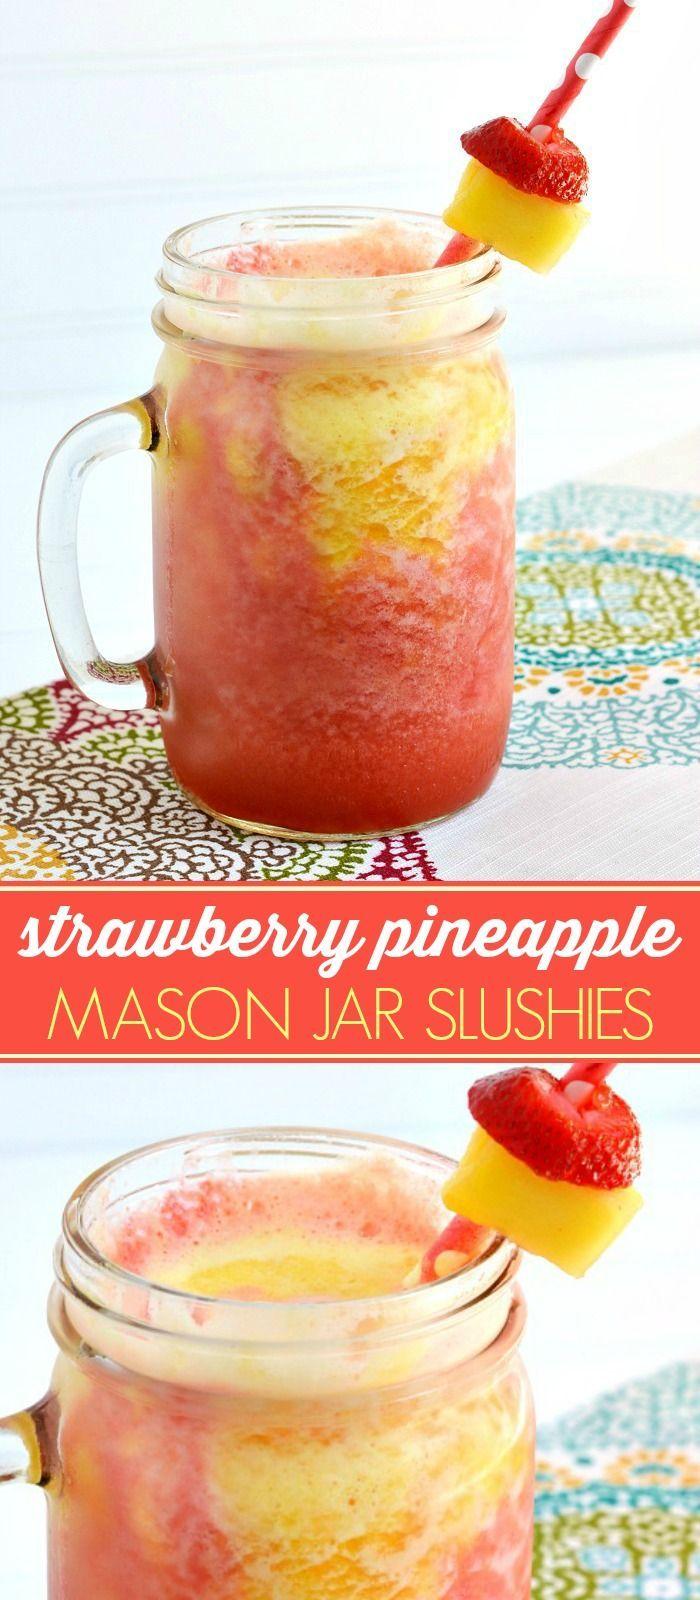 how to make pineapple slushies